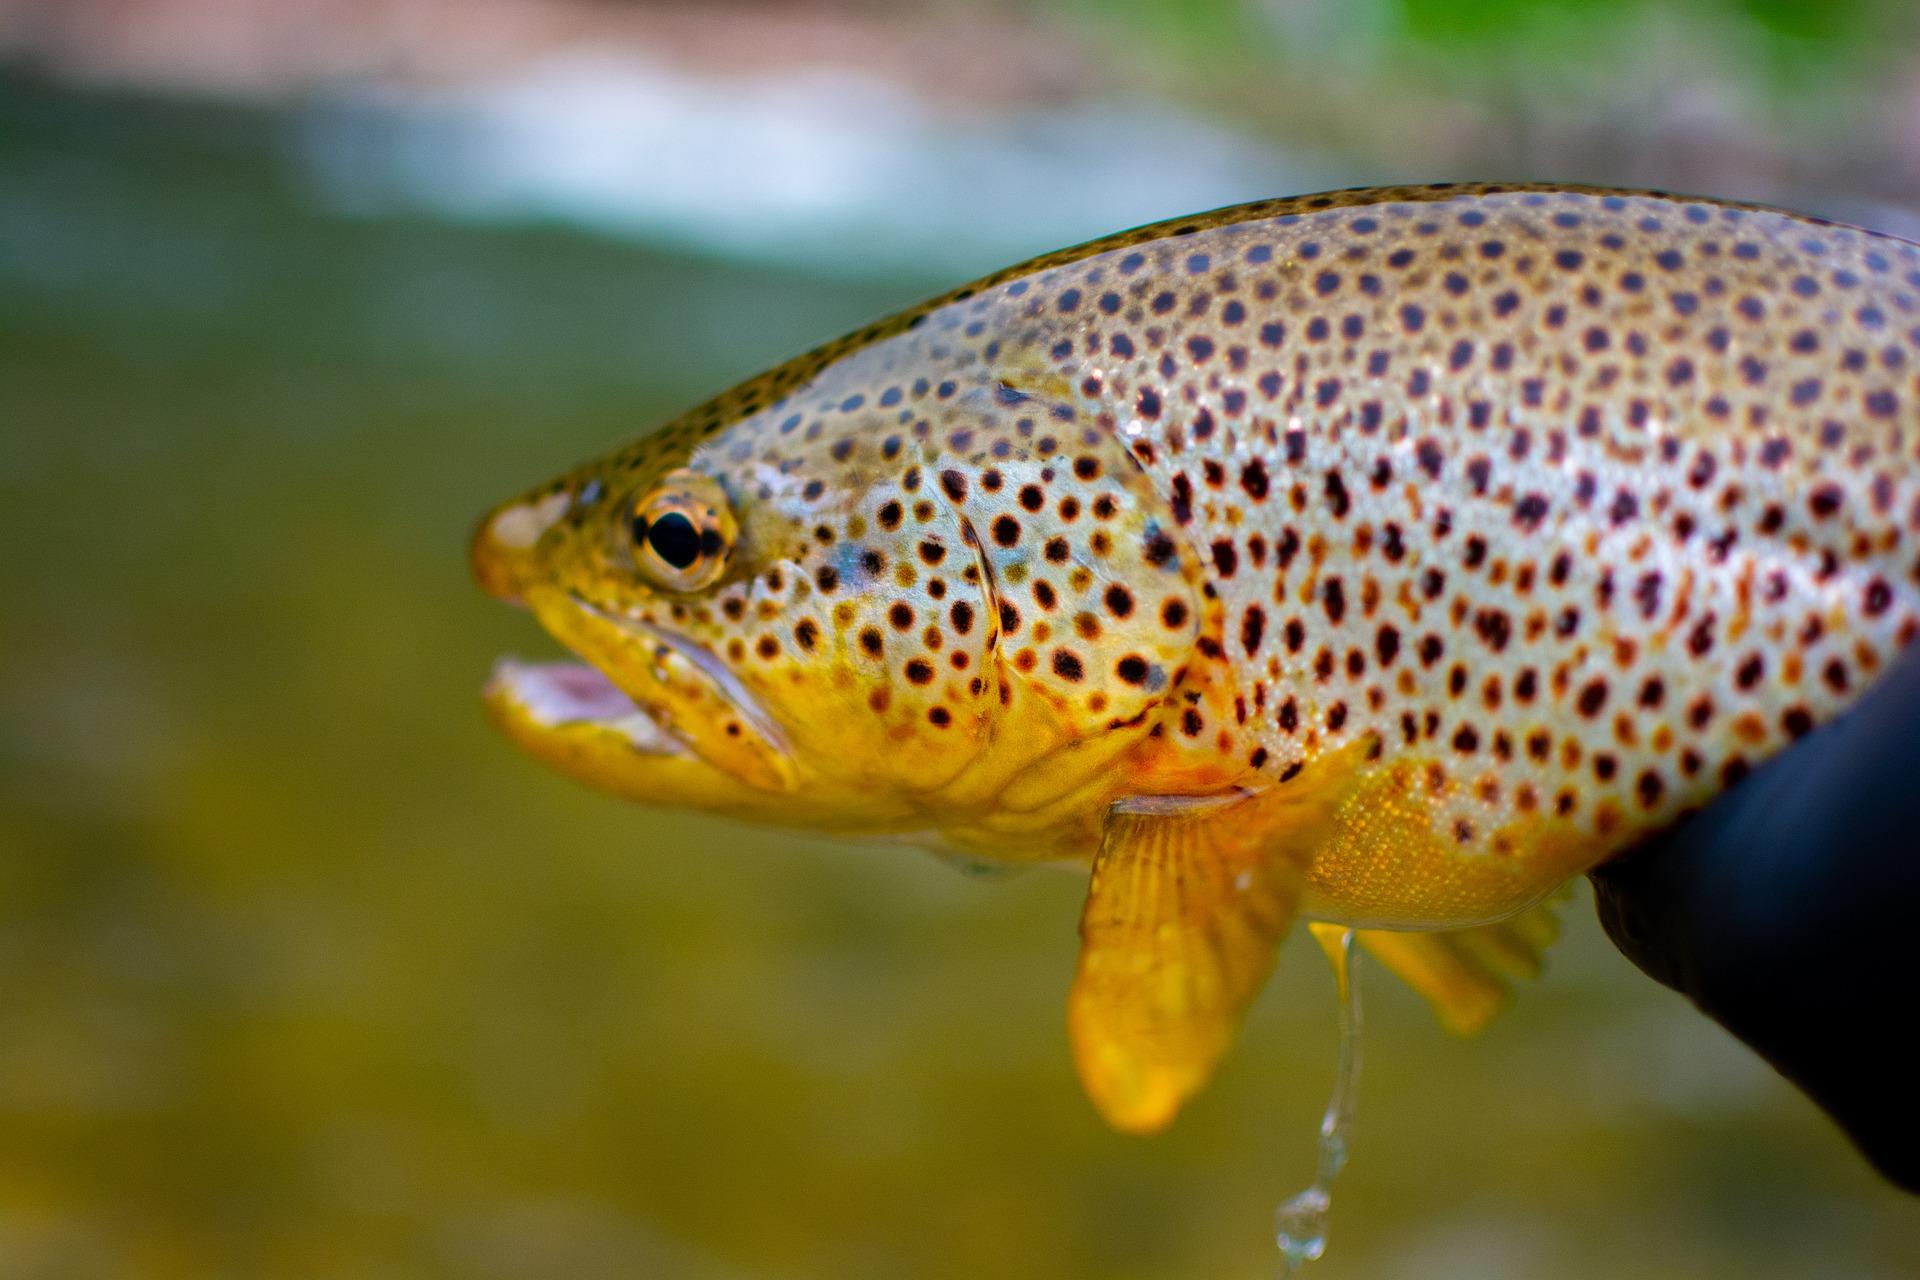 fish-5566856_1920.jpg